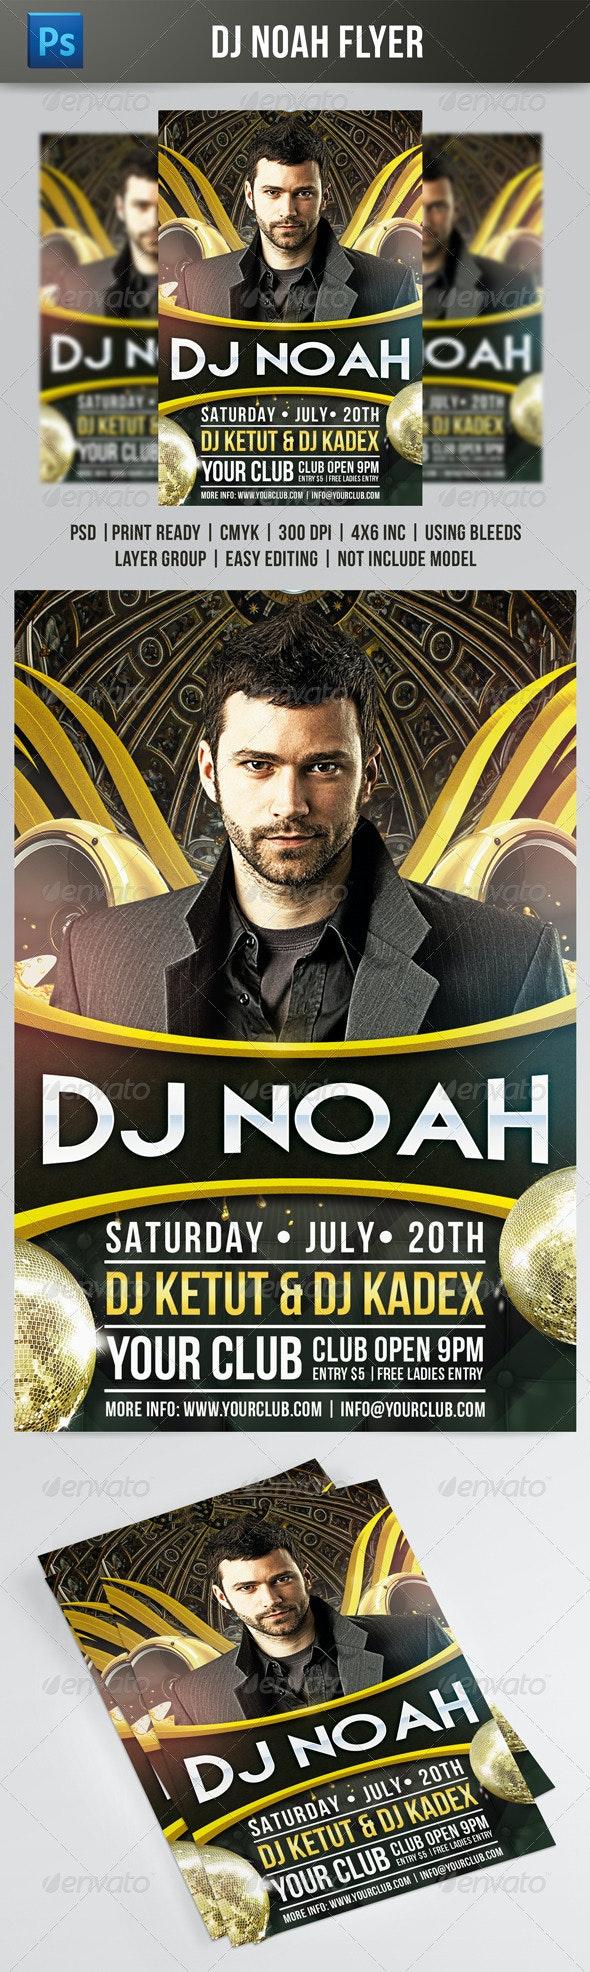 DJ Noah Flyer Template - Clubs & Parties Events